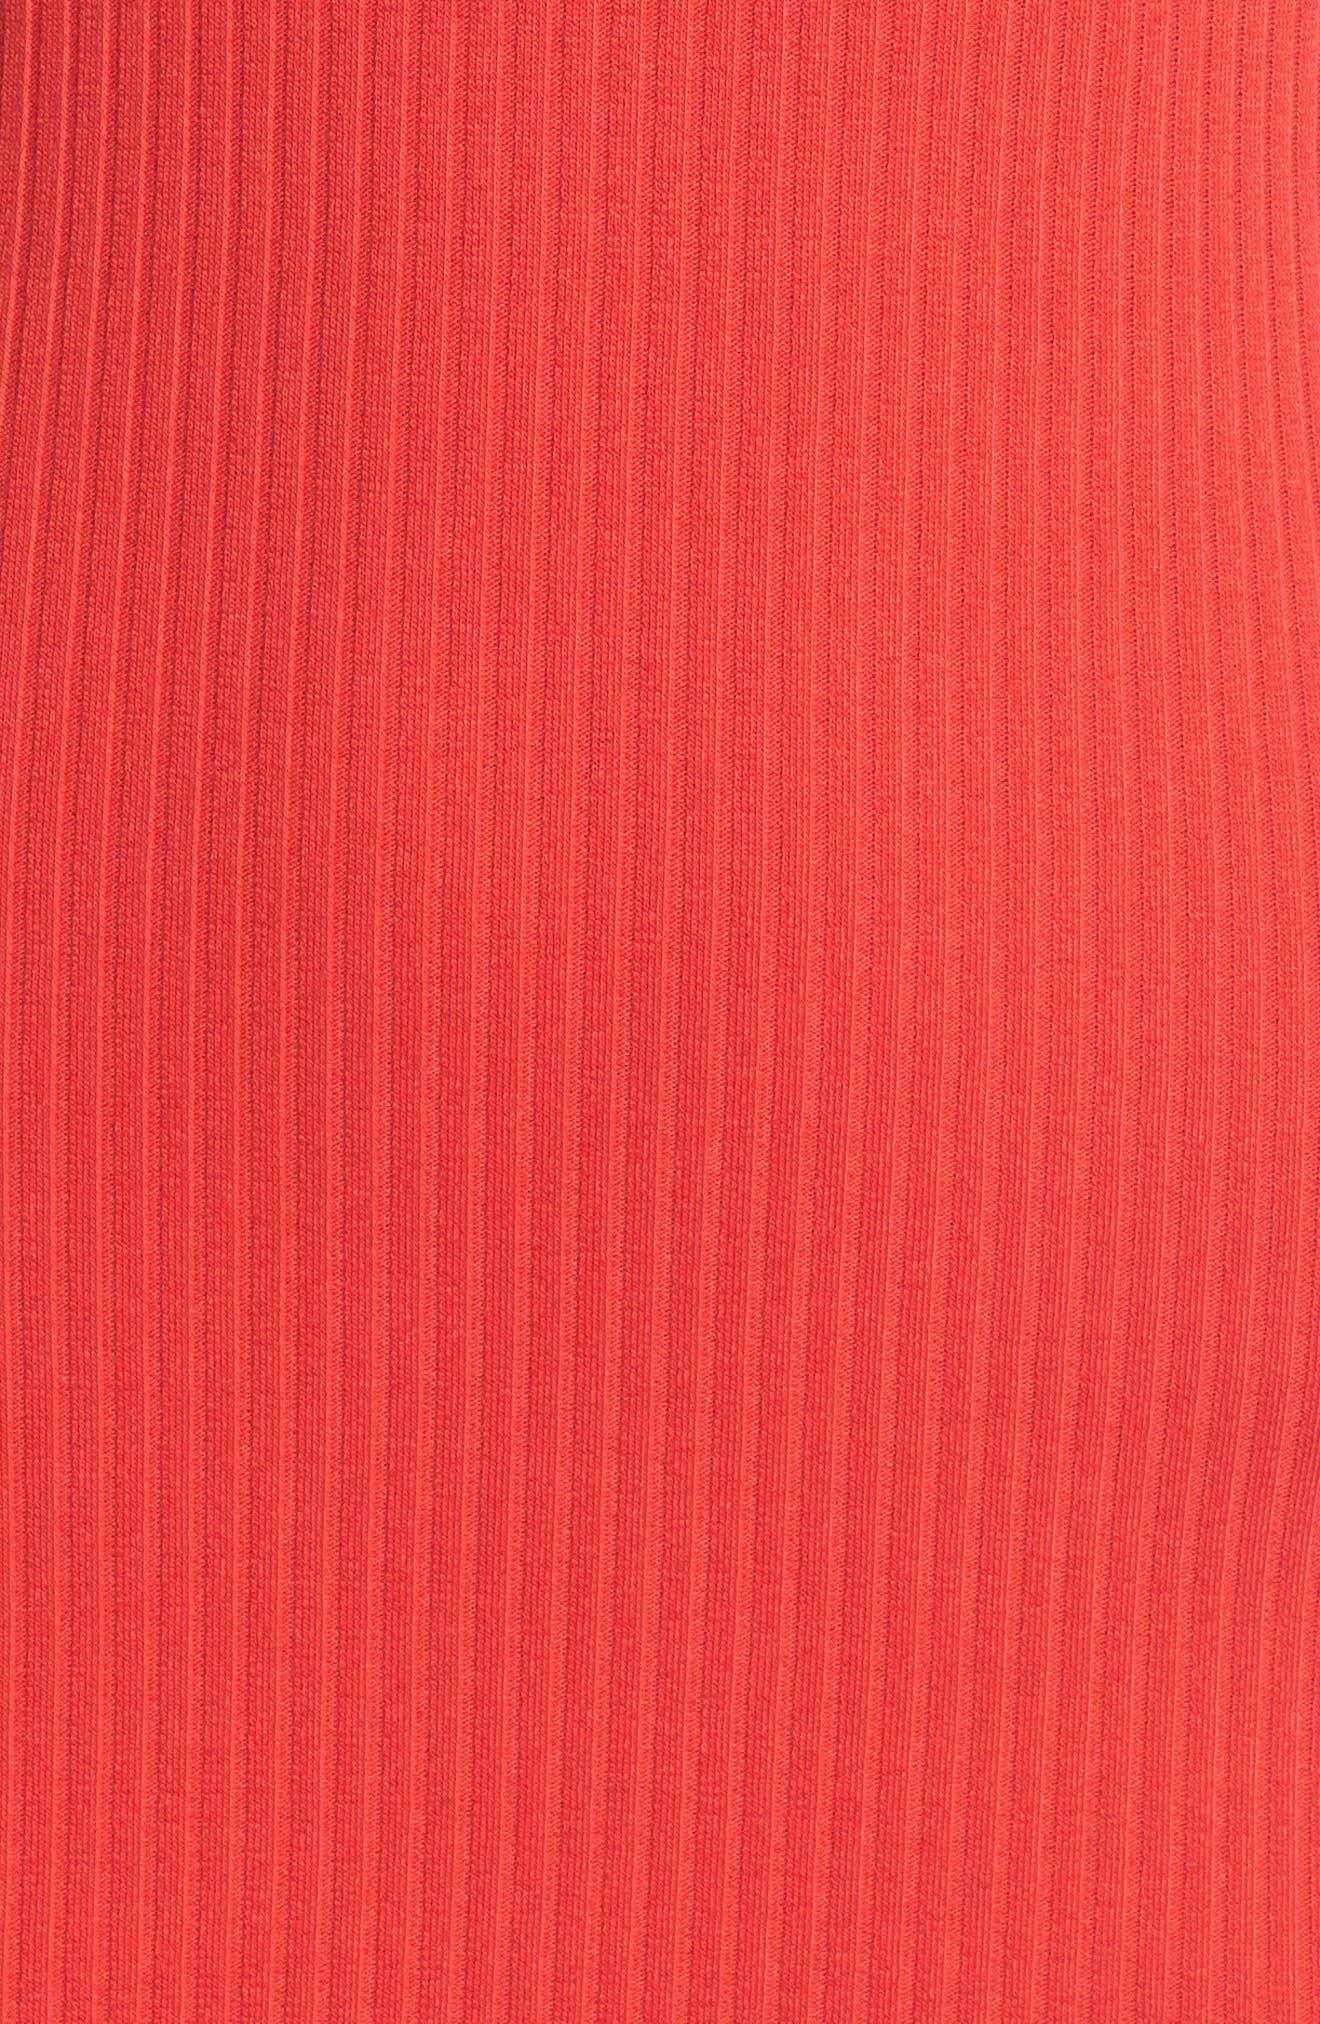 Tommy Rib Knit Tank Dress,                             Alternate thumbnail 6, color,                             SHANGHAI RED